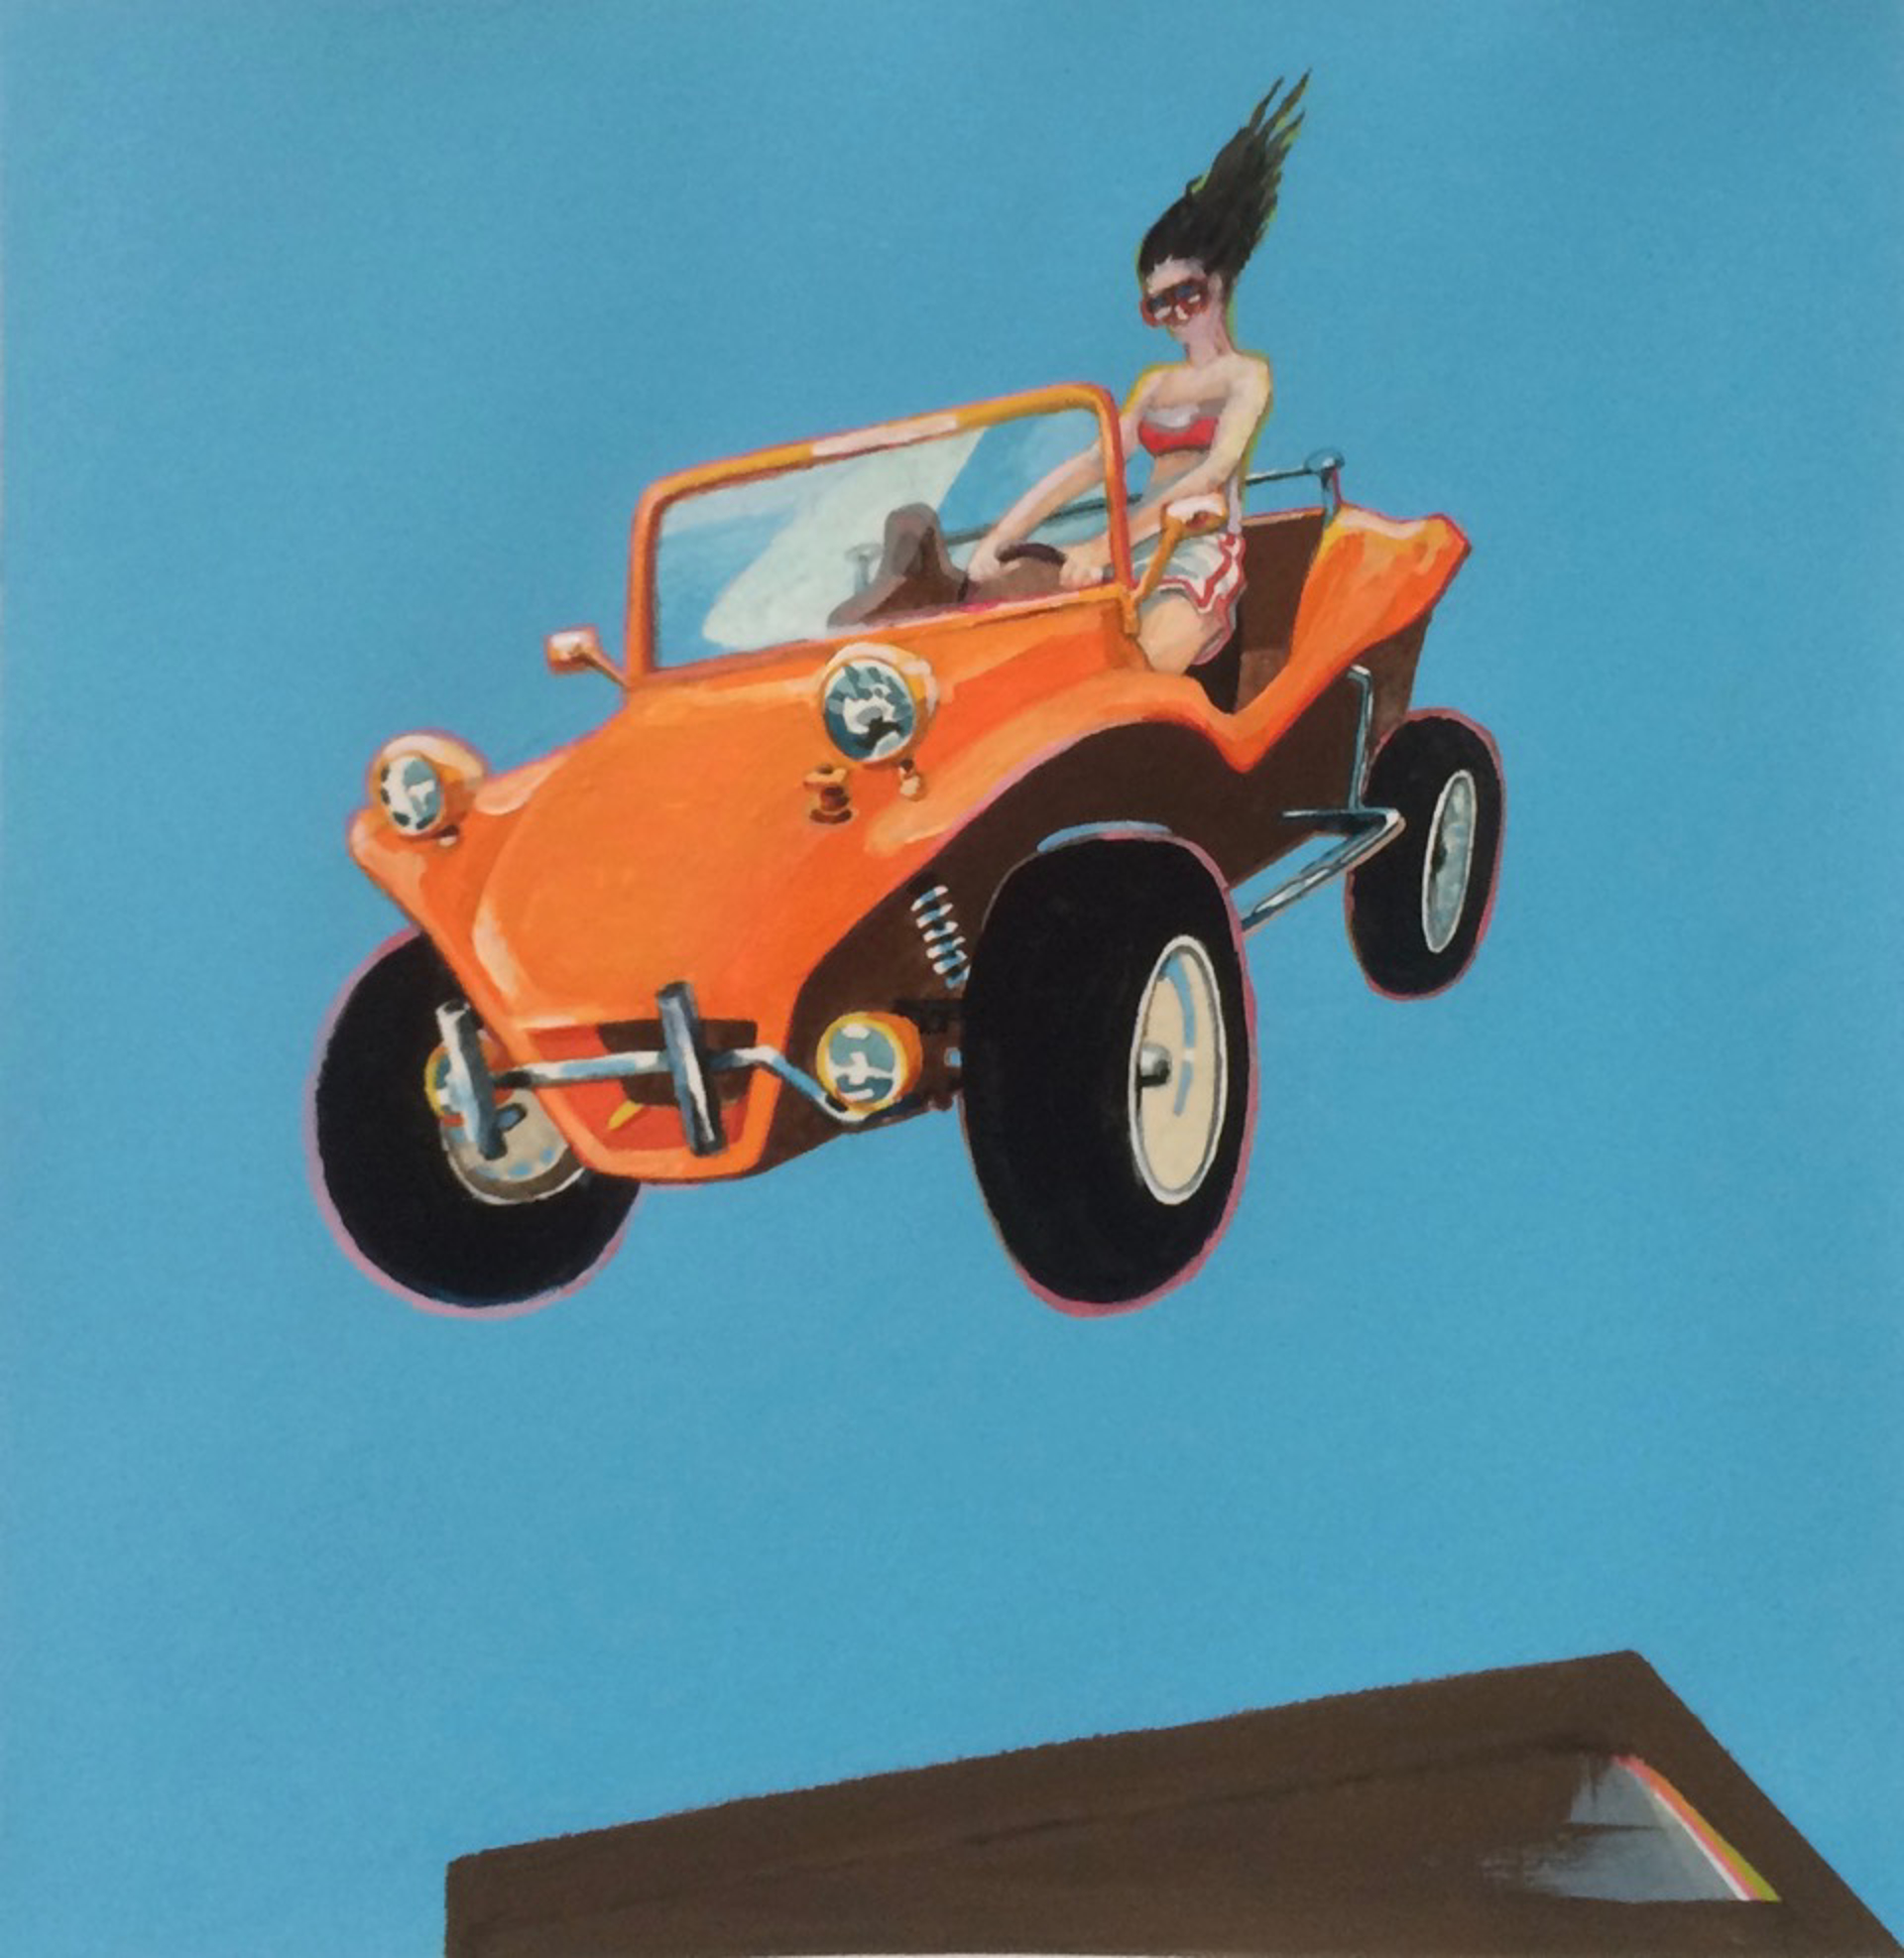 Bug Air by Joe Currie